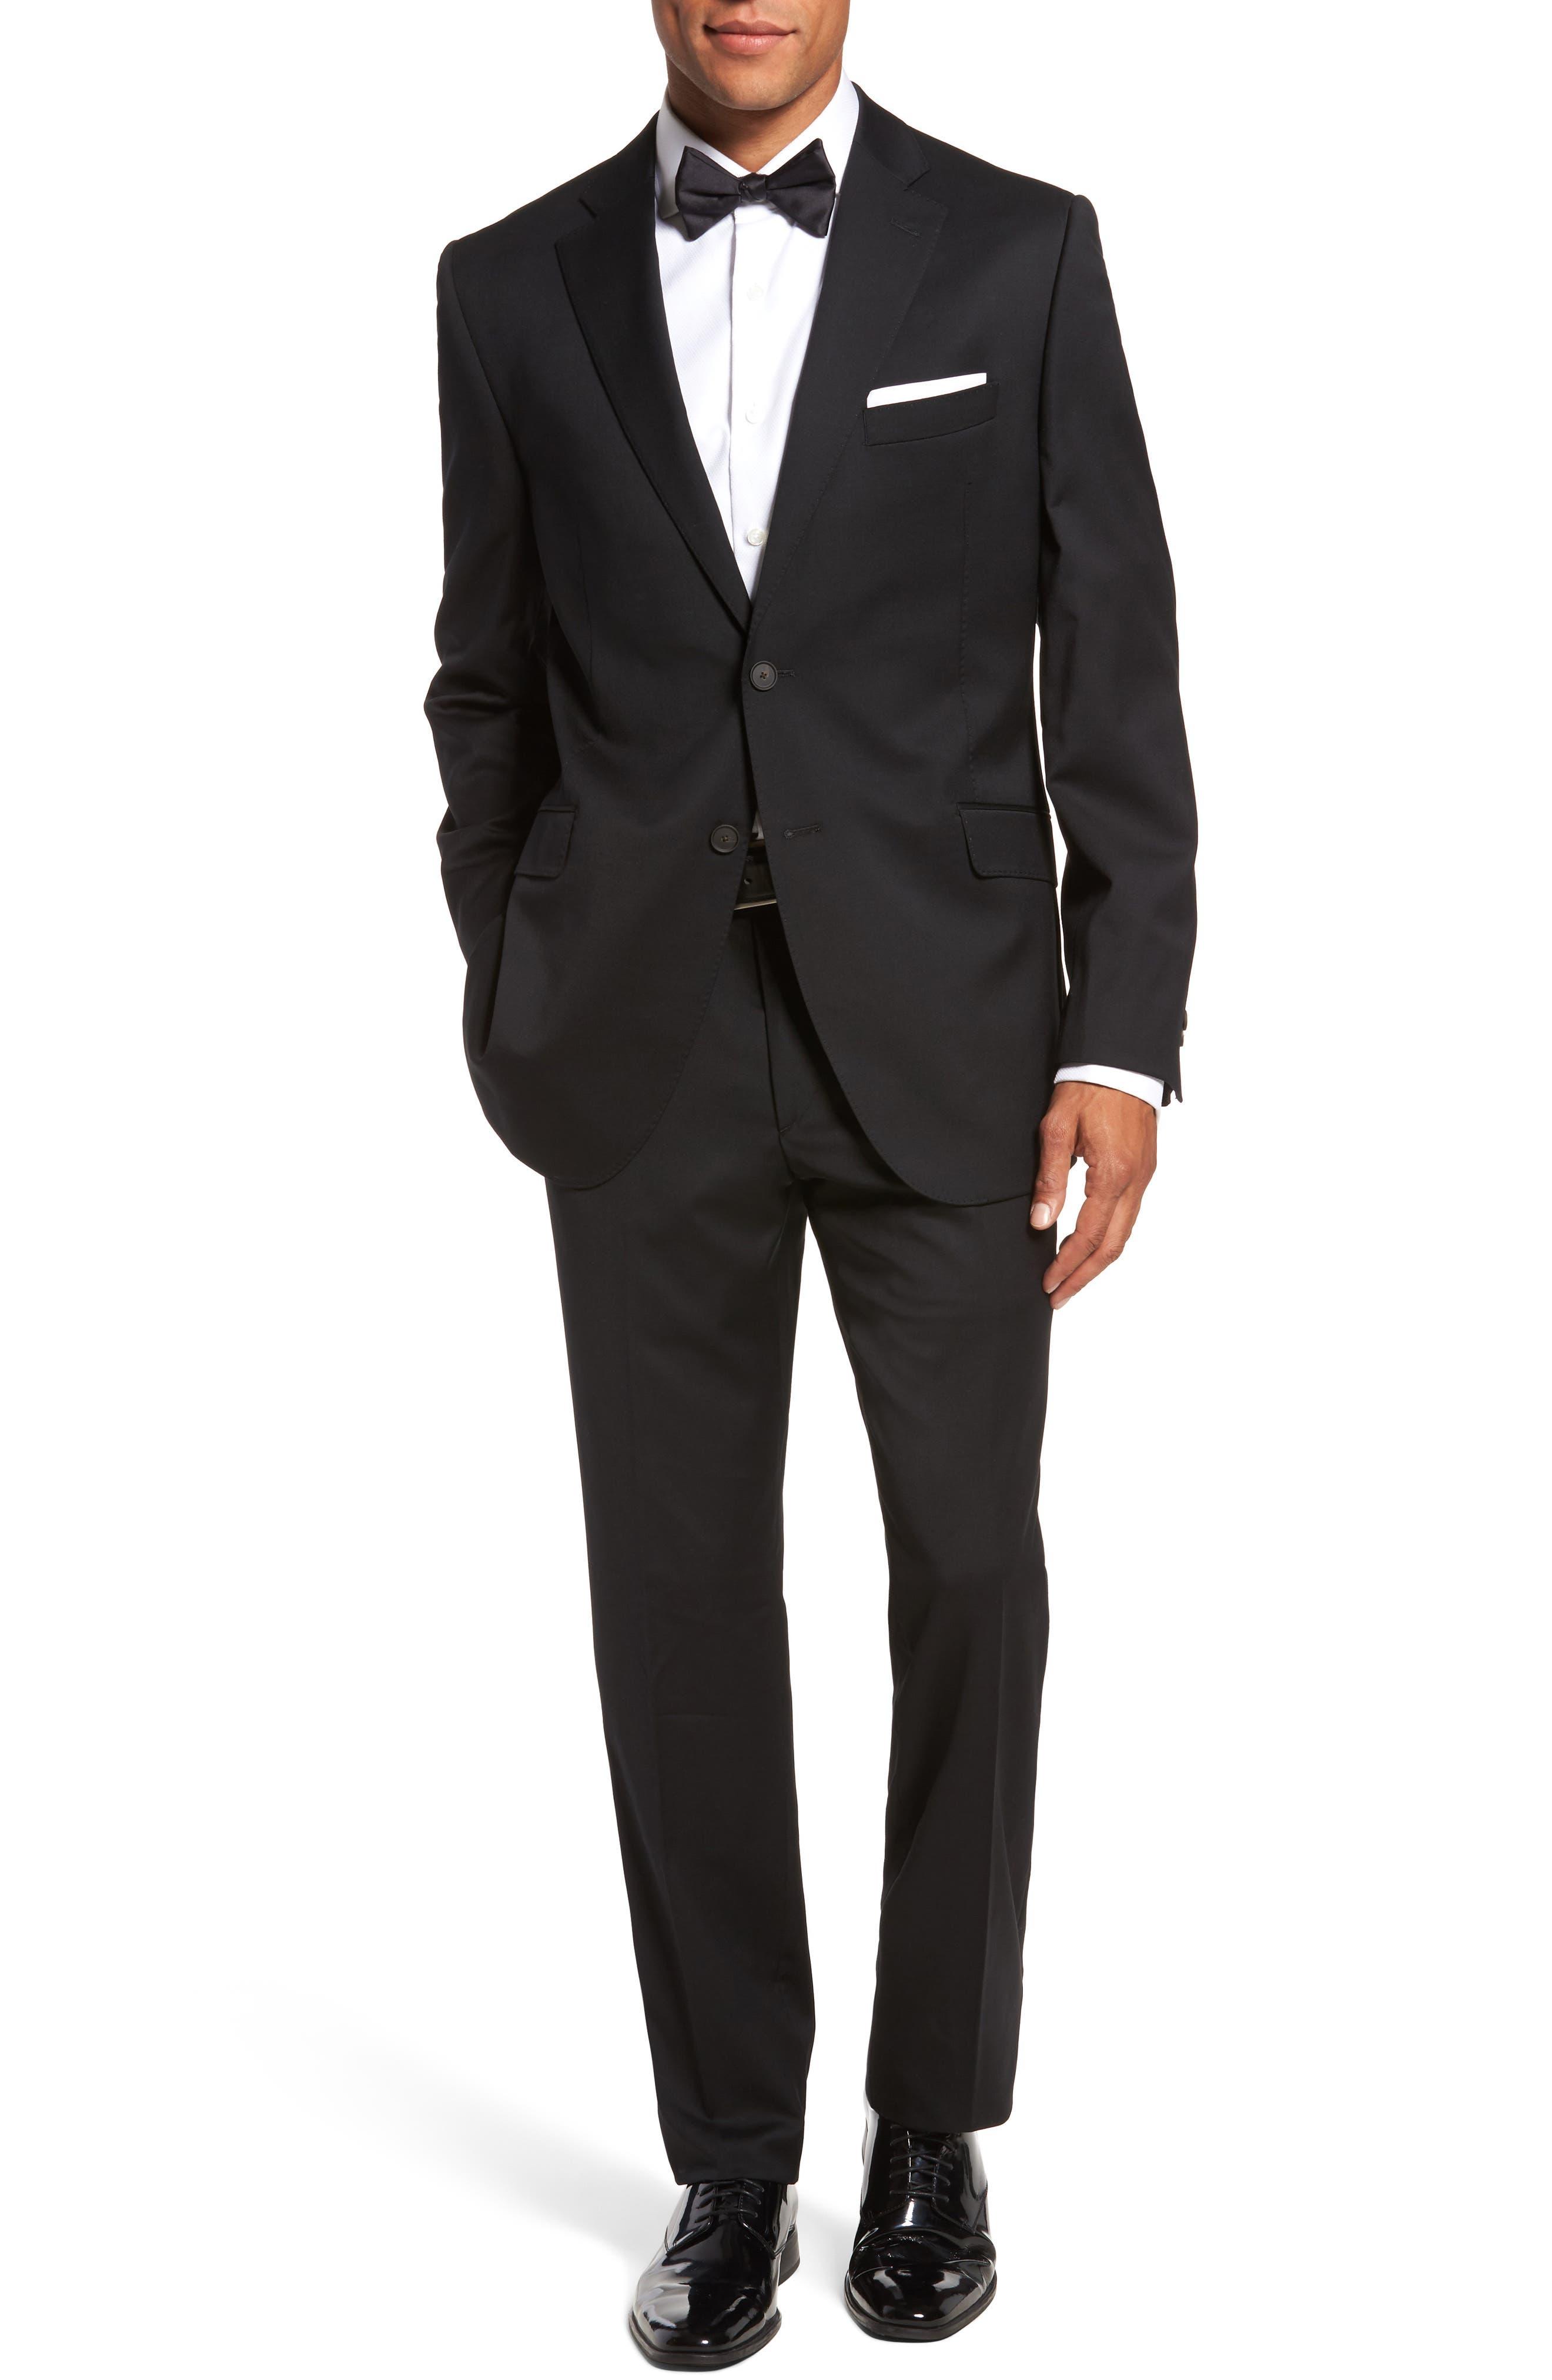 Main Image - Kroon Keidis Aim Classic Fit Stretch Wool Suit